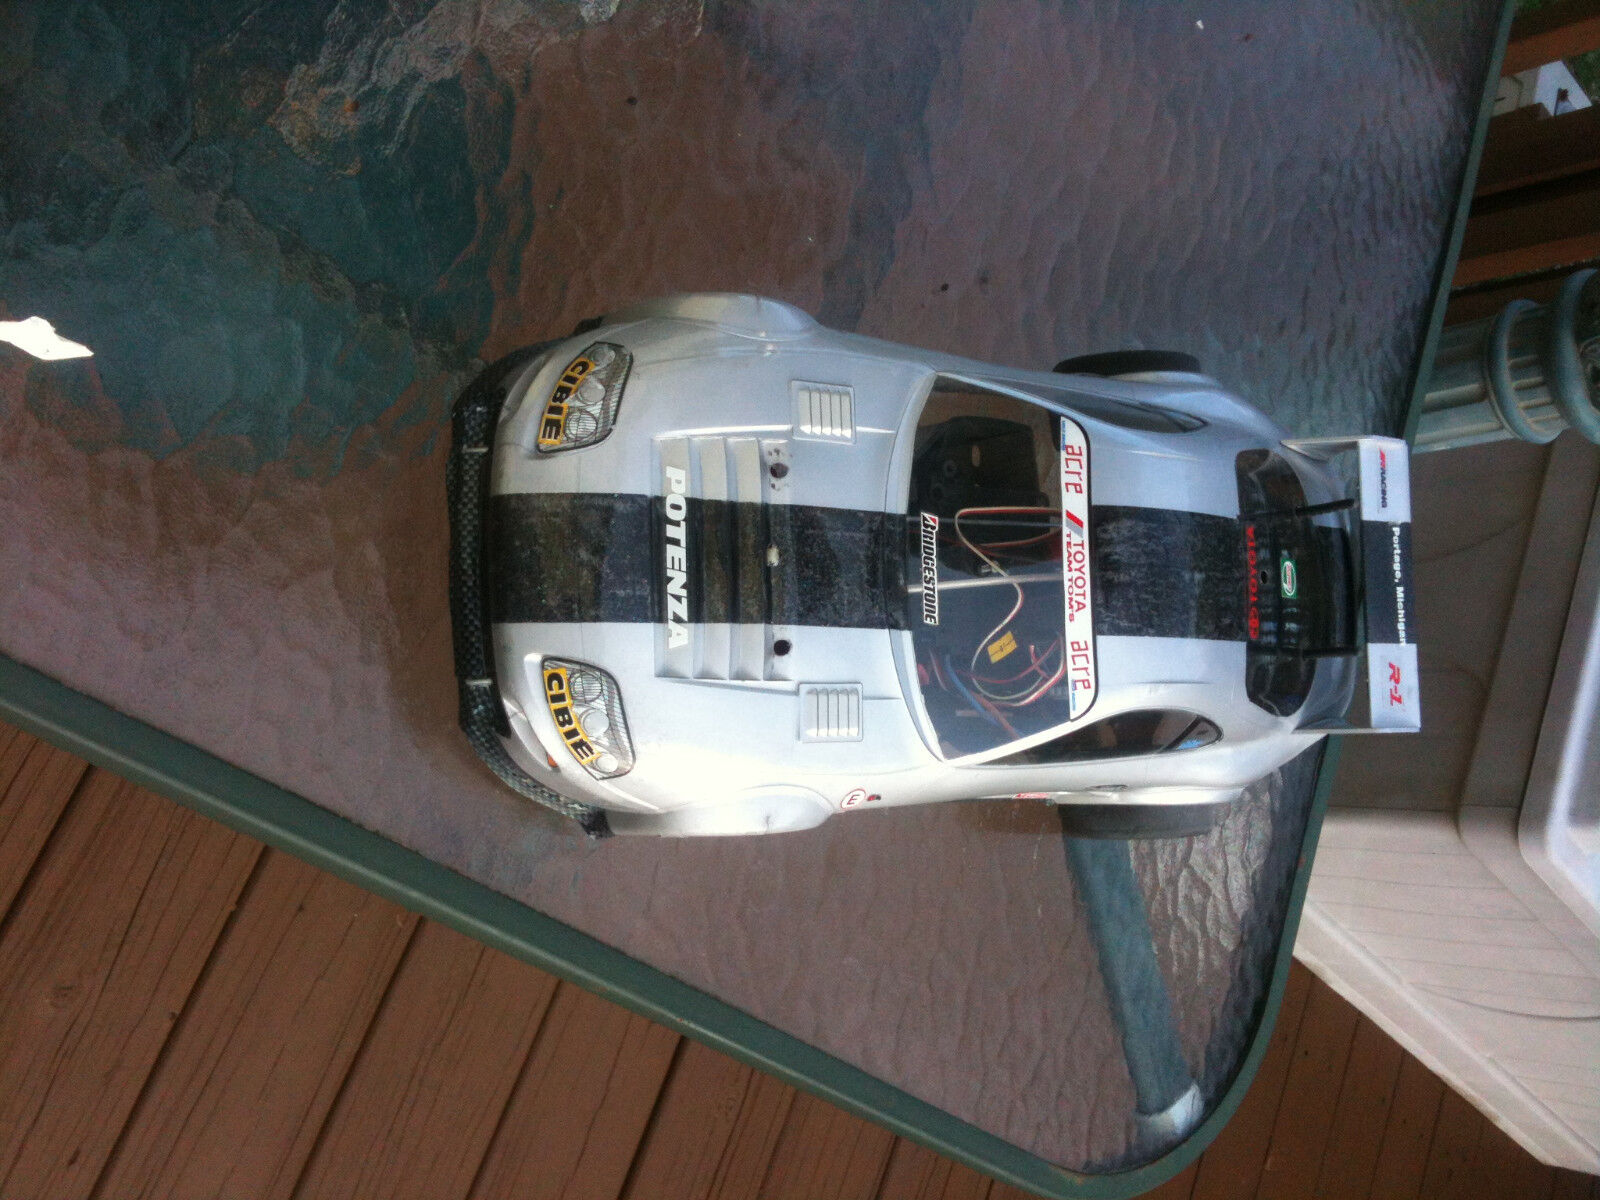 TAMIYA 58170 1 10 CASTROL TOYOTA Vintage Supra-GT Supra-GT Supra-GT RC RACE CAR  4WD TAO2W ta-02 339aaa